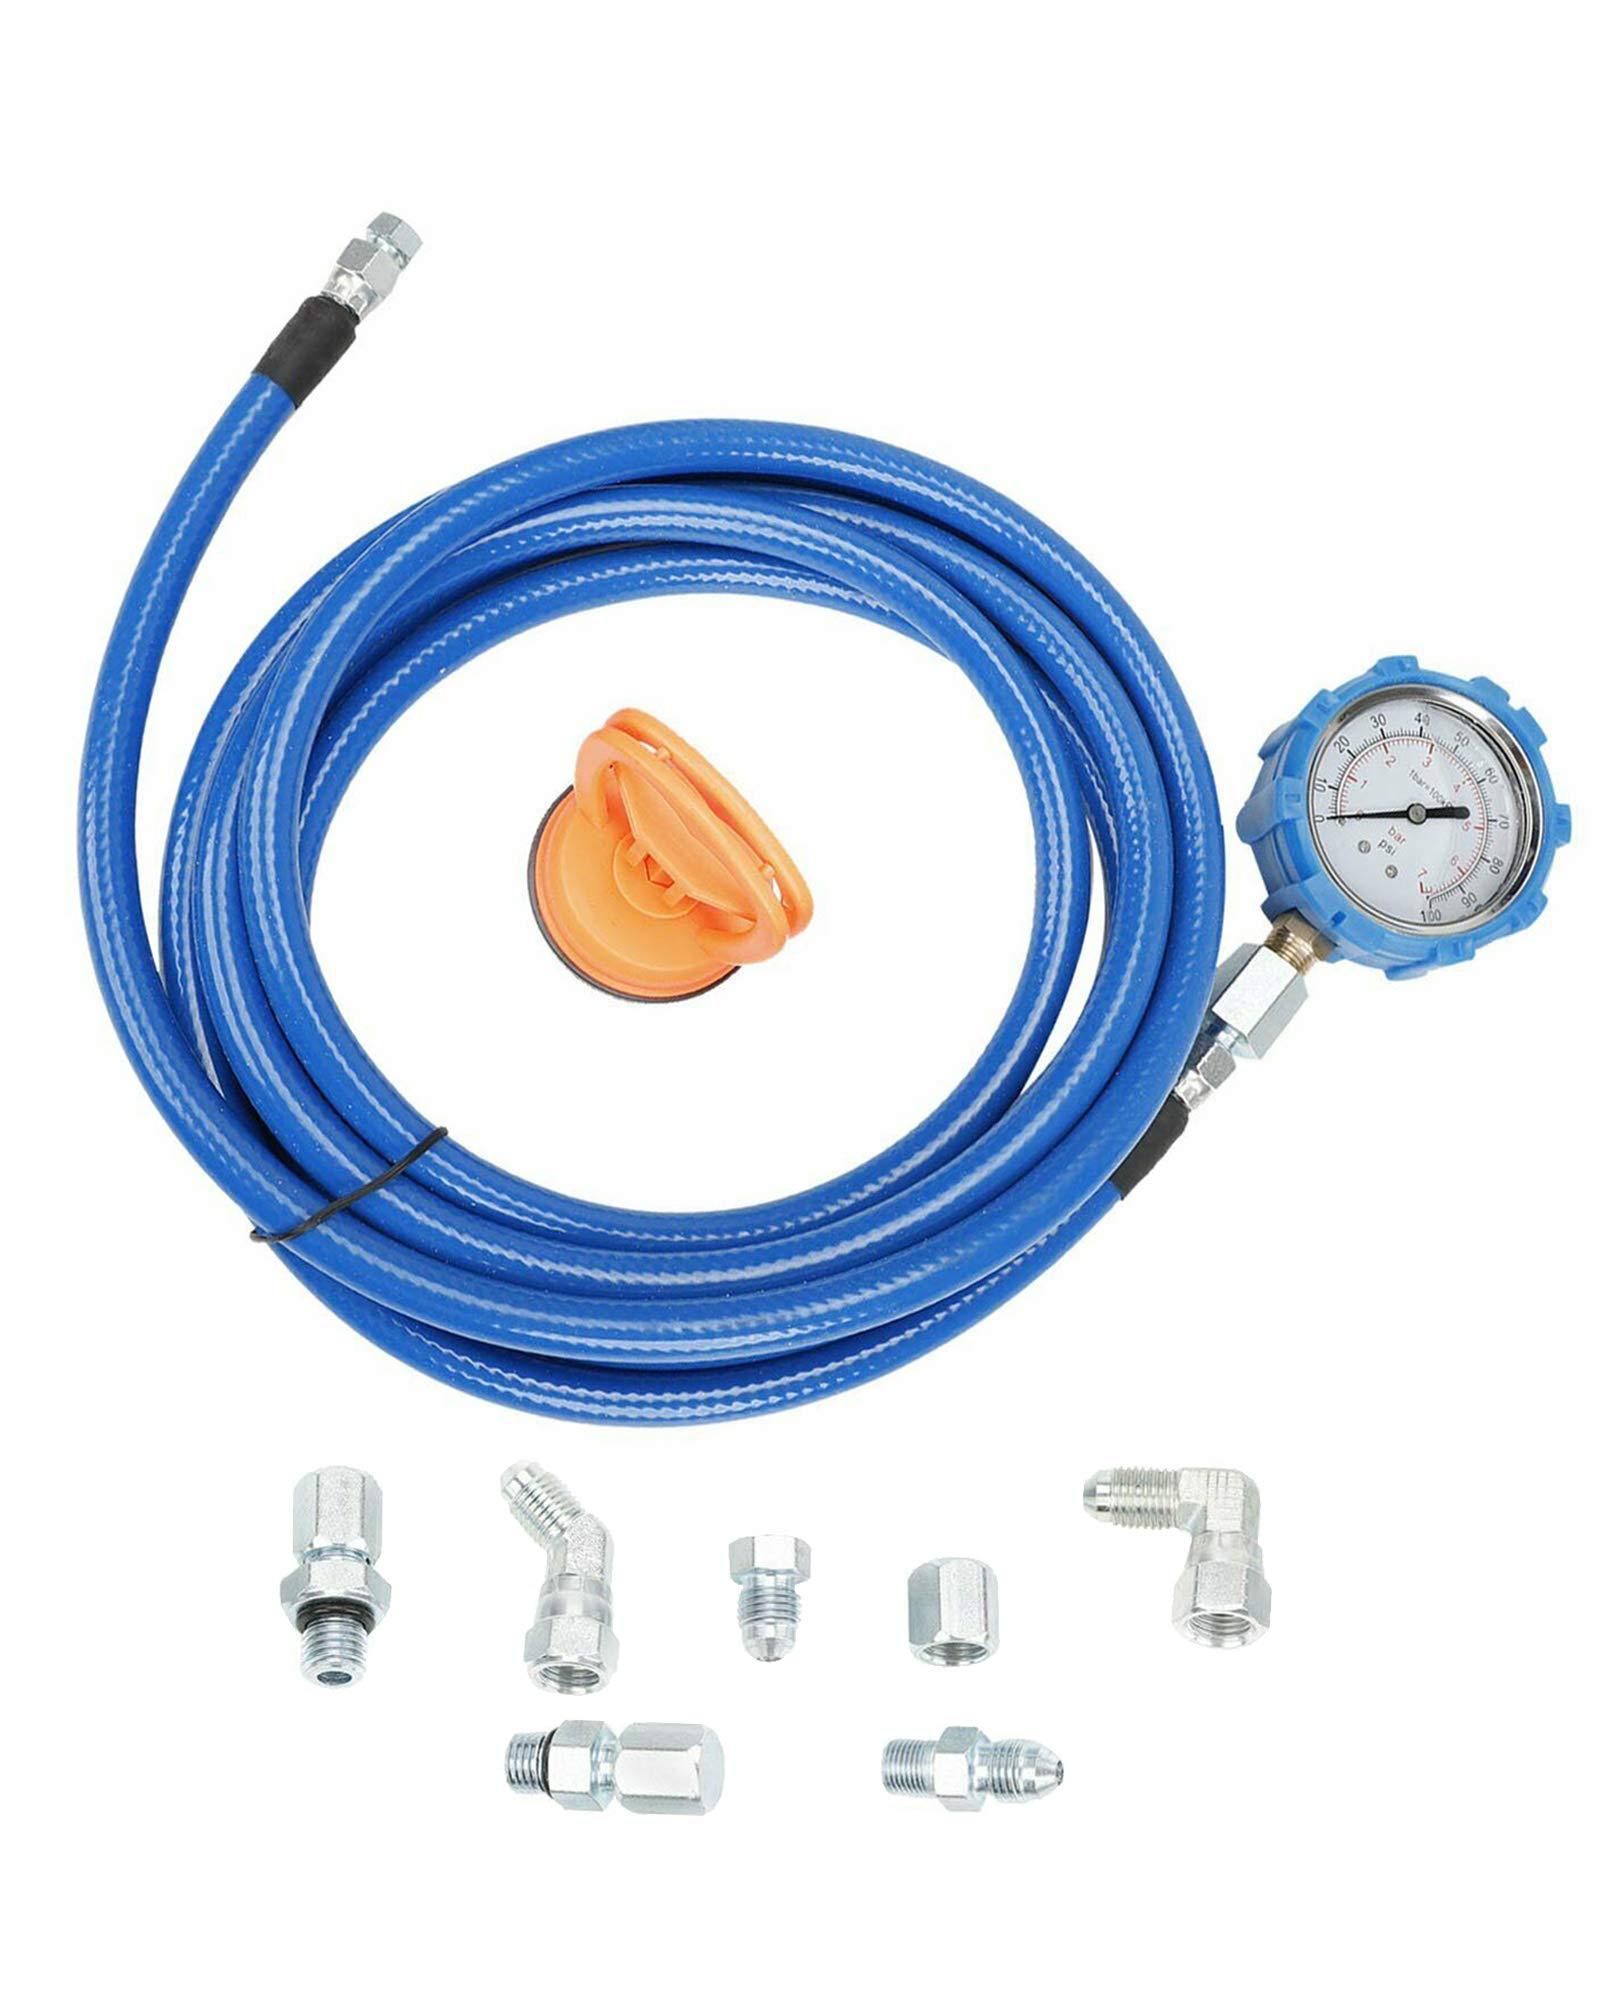 BLACKHORSE-RACING Engine Oil Pressure Test Kit, Powerstroke Fuel with Oil Pressure Mechanical Gauge Test Tool Set for Ford 6.0L & 7.3L Engines